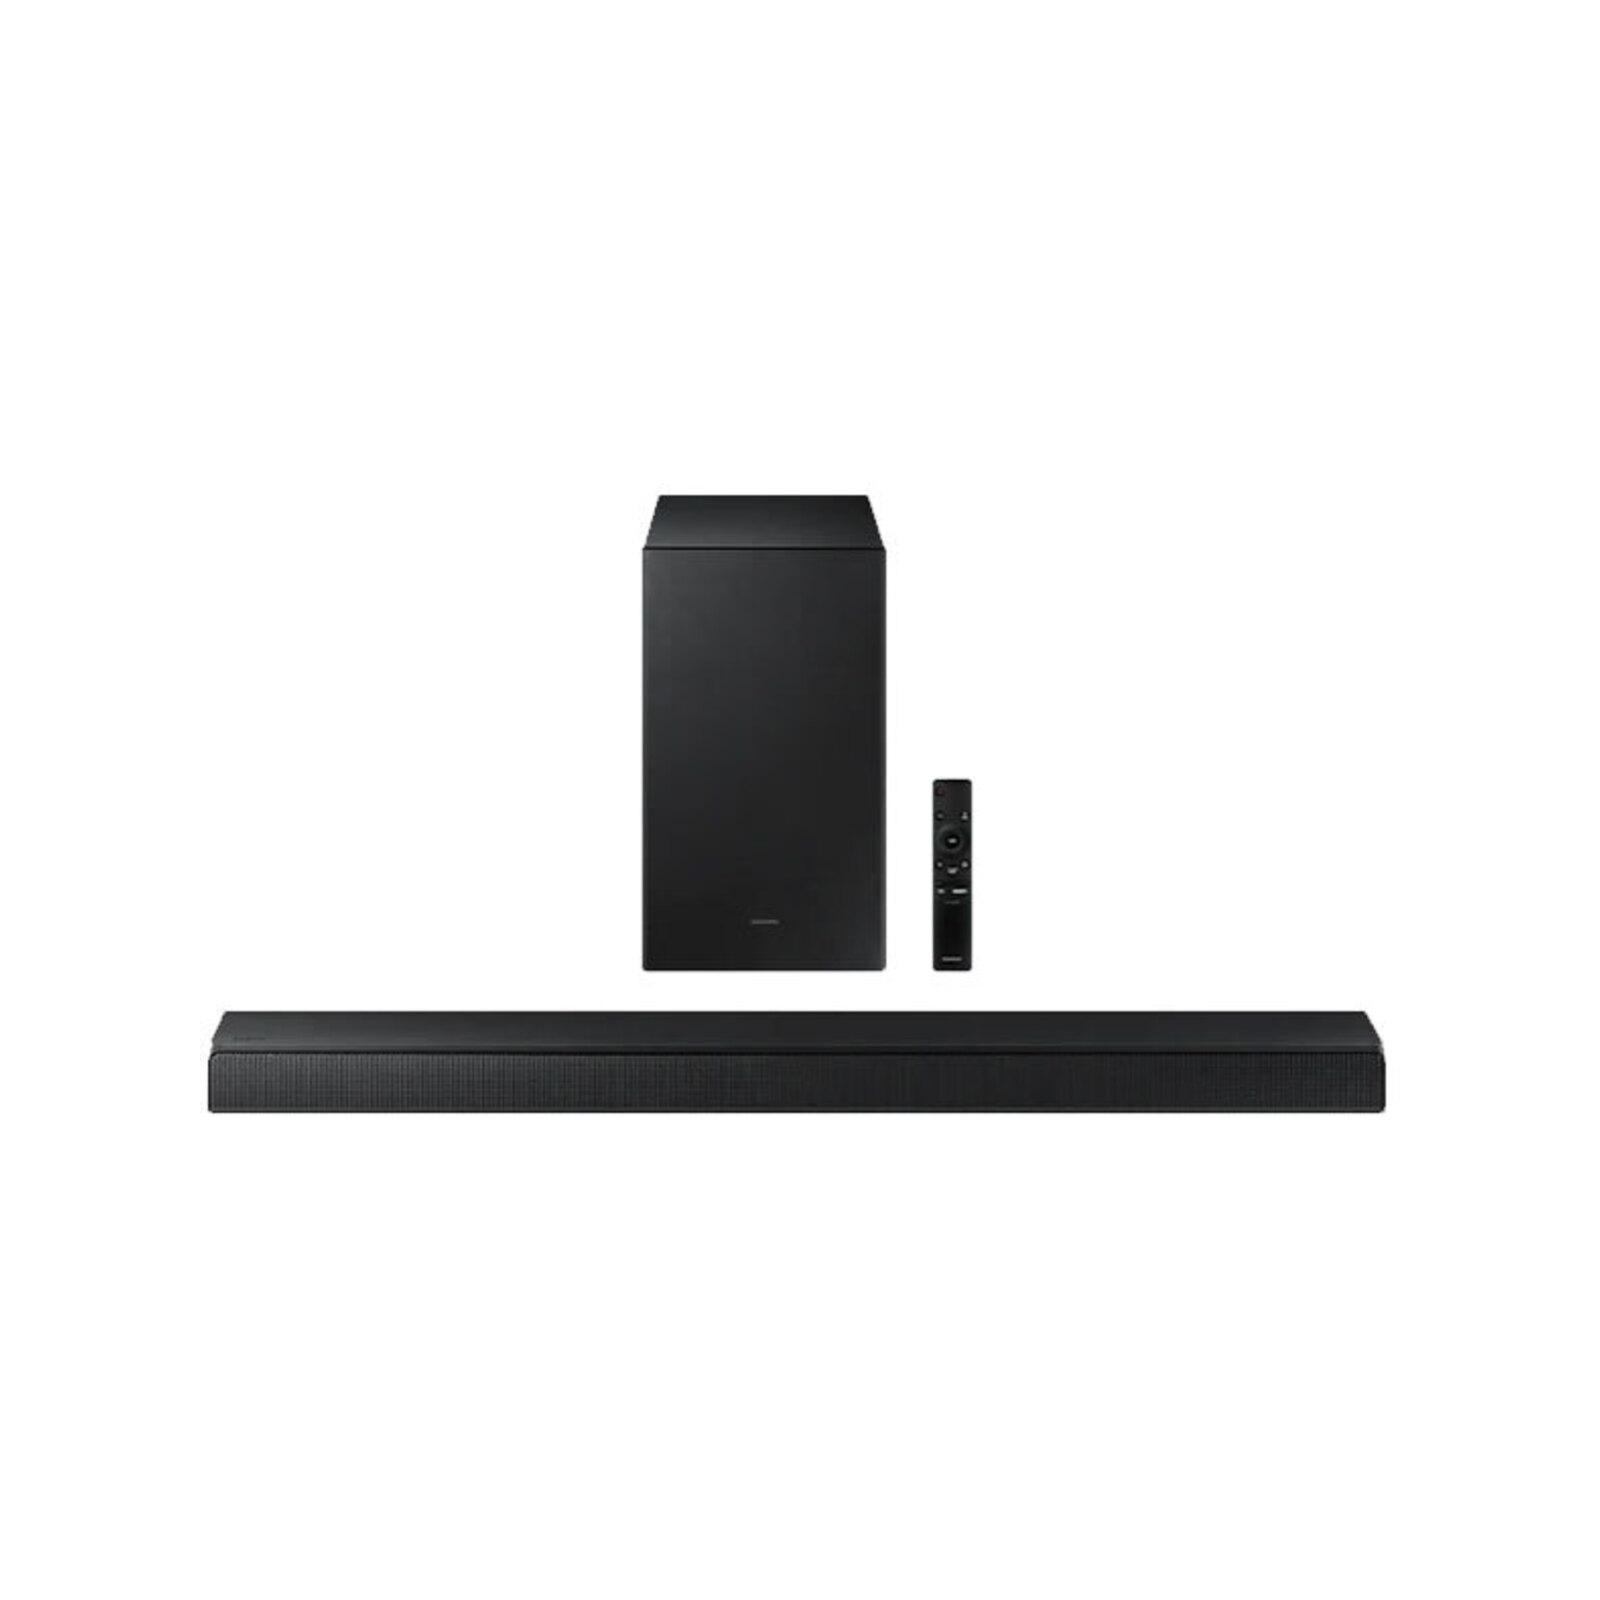 Samsung A550 A-Series Soundbar w/ Subwoofer 2.1ch HDMI Wireless Speaker System